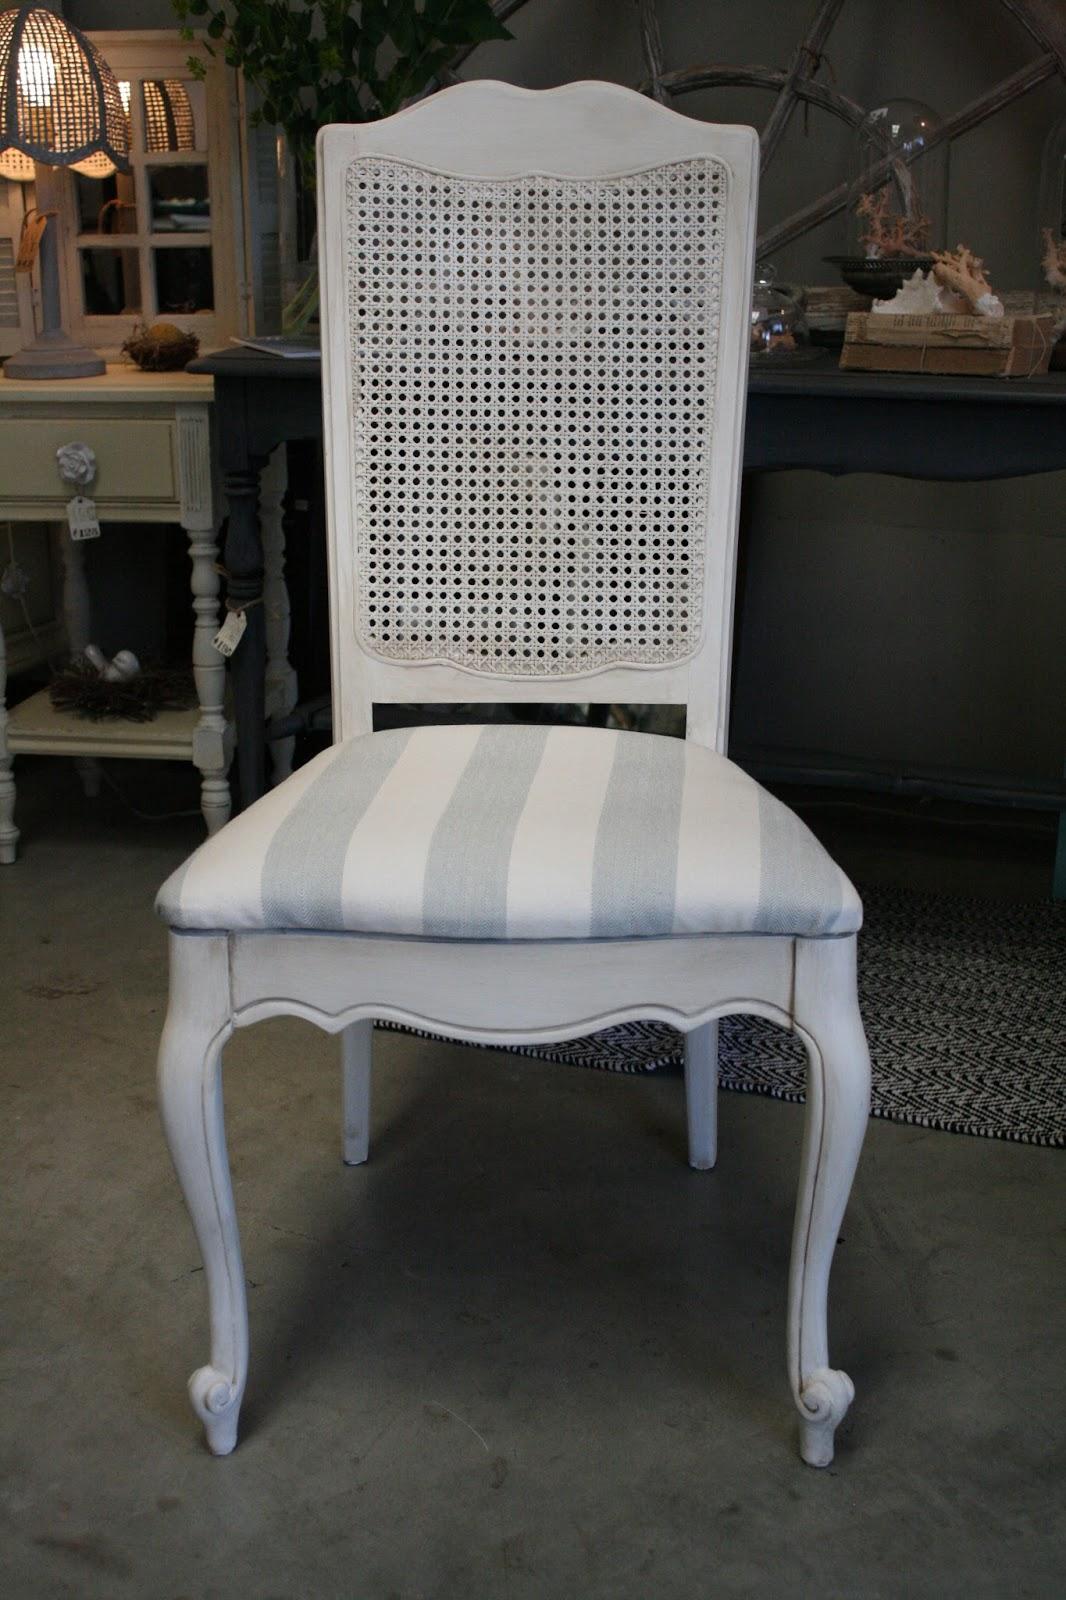 Cane Back Dining Chair Air Horn Under Office Prank Reloved Rubbish Vintage Set